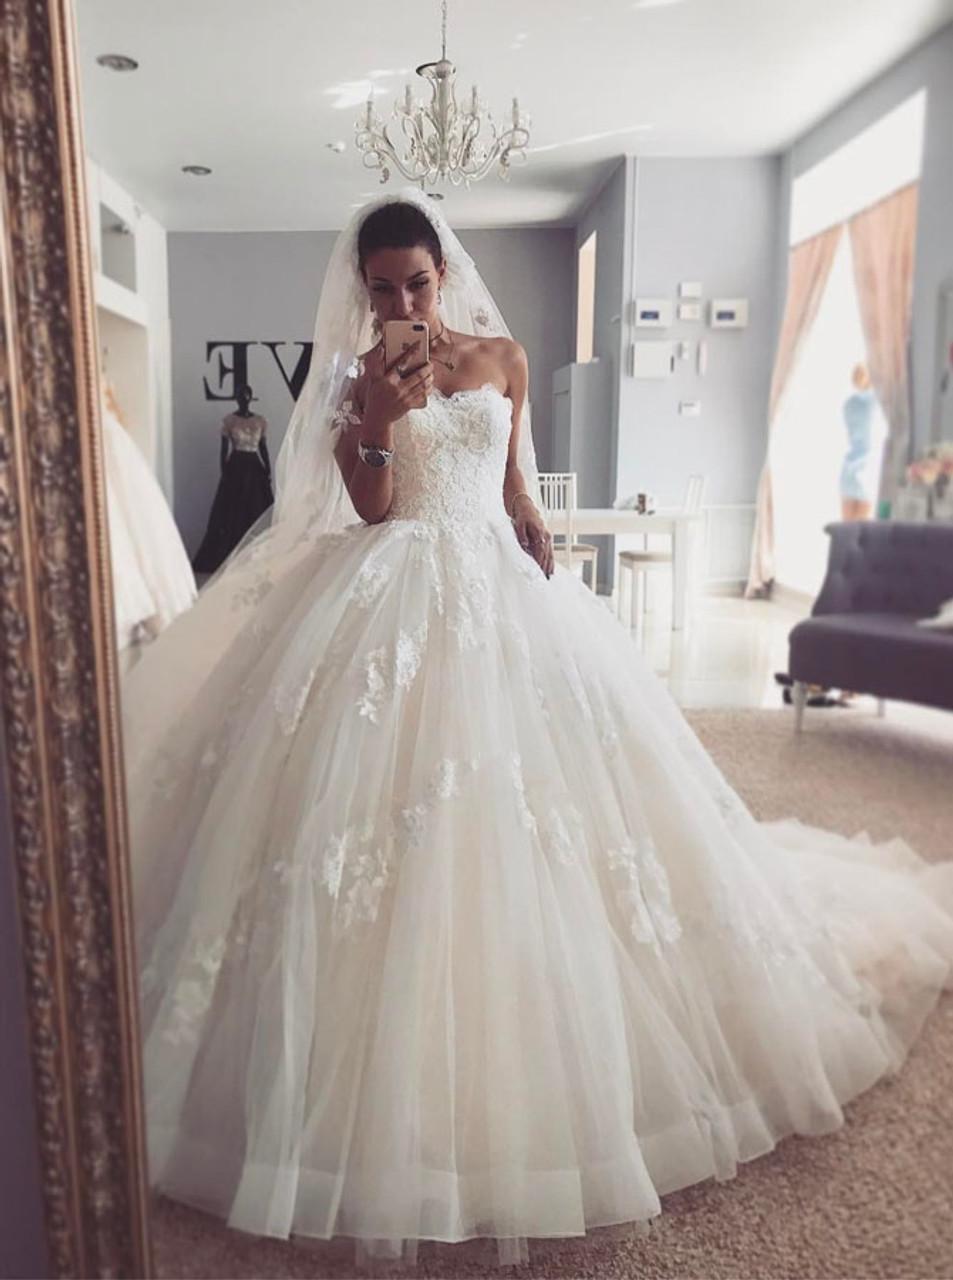 Strapless Wedding Dress,Gorgeous Bridal Gown,20